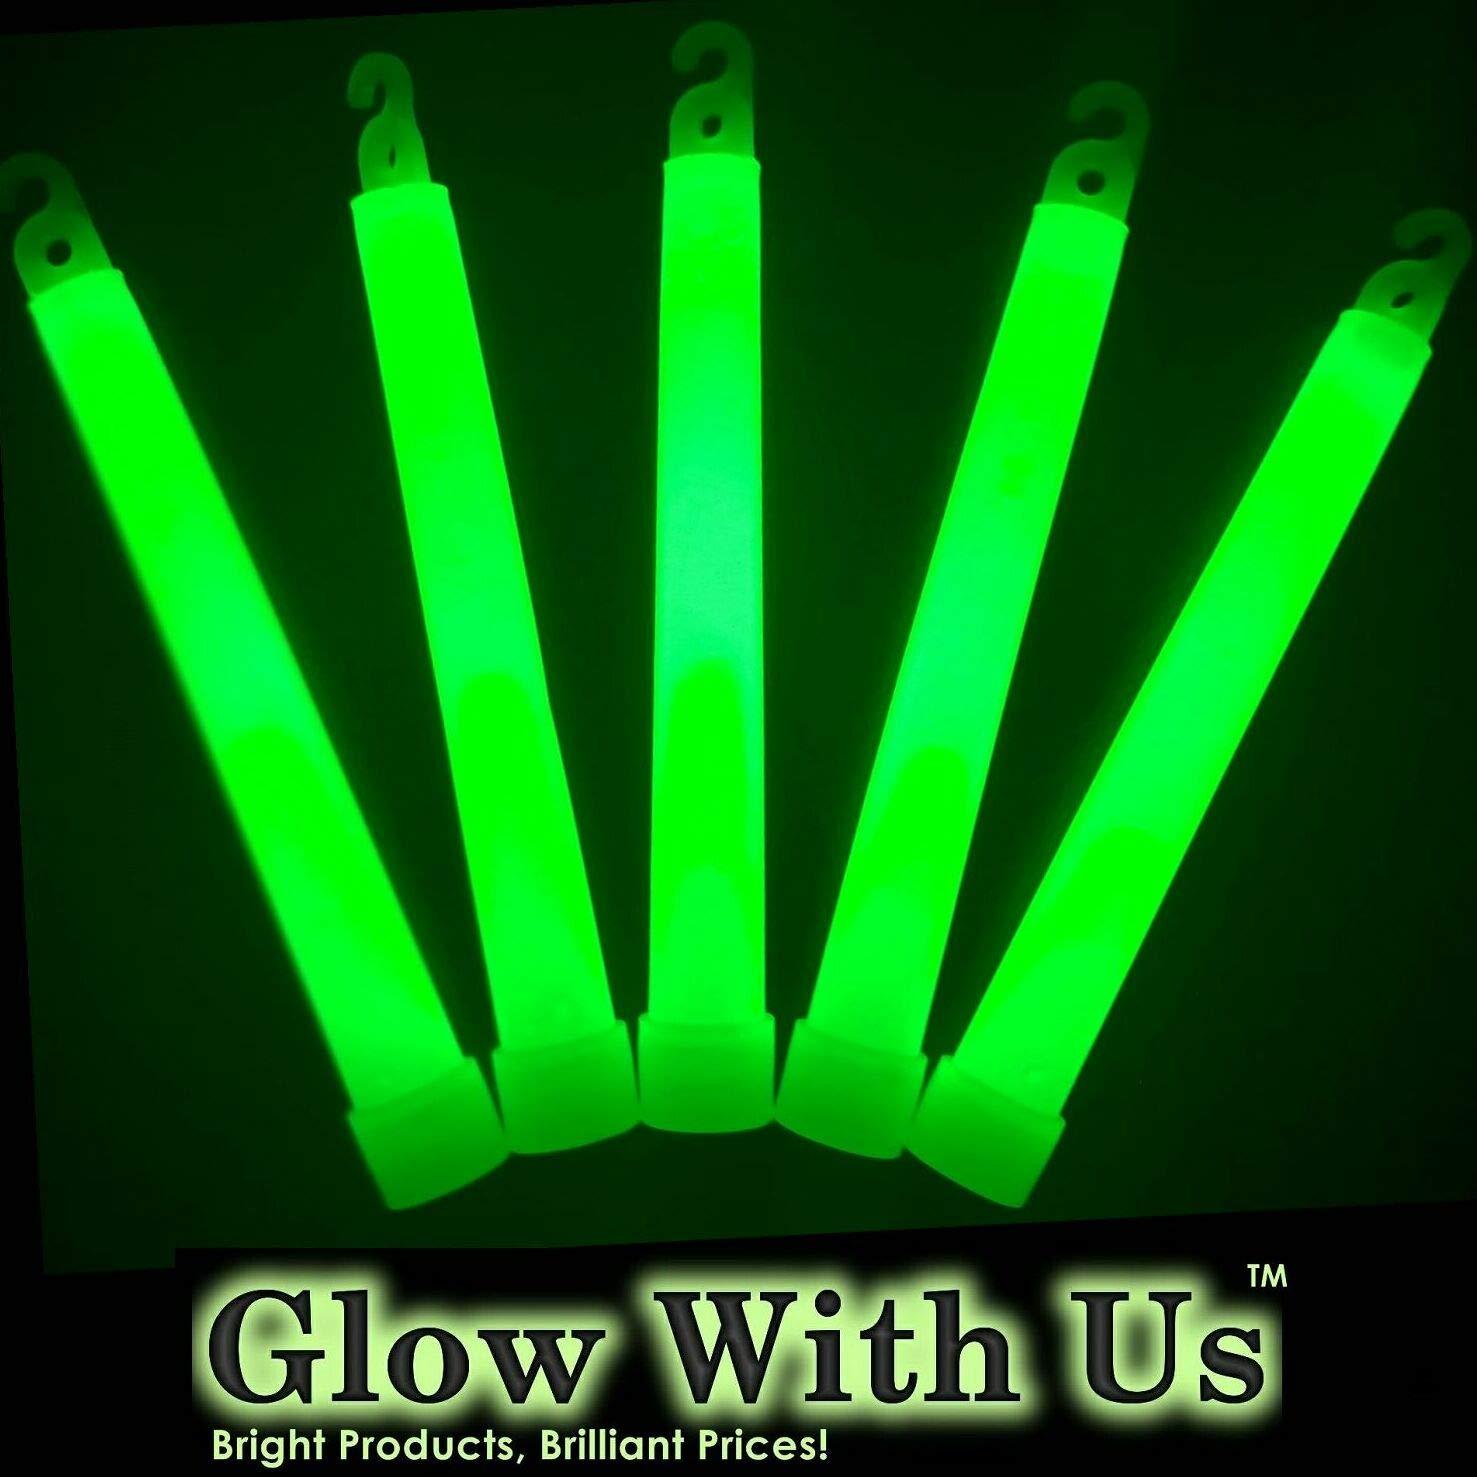 "Glow Sticks Bulk Wholesale, 100 6"" Industrial Grade Green Light Sticks, Bright Color, Glow 12-14 Hrs, Safety Glow Stick with 3-Year Shelf Life, GlowWithUs Brand"